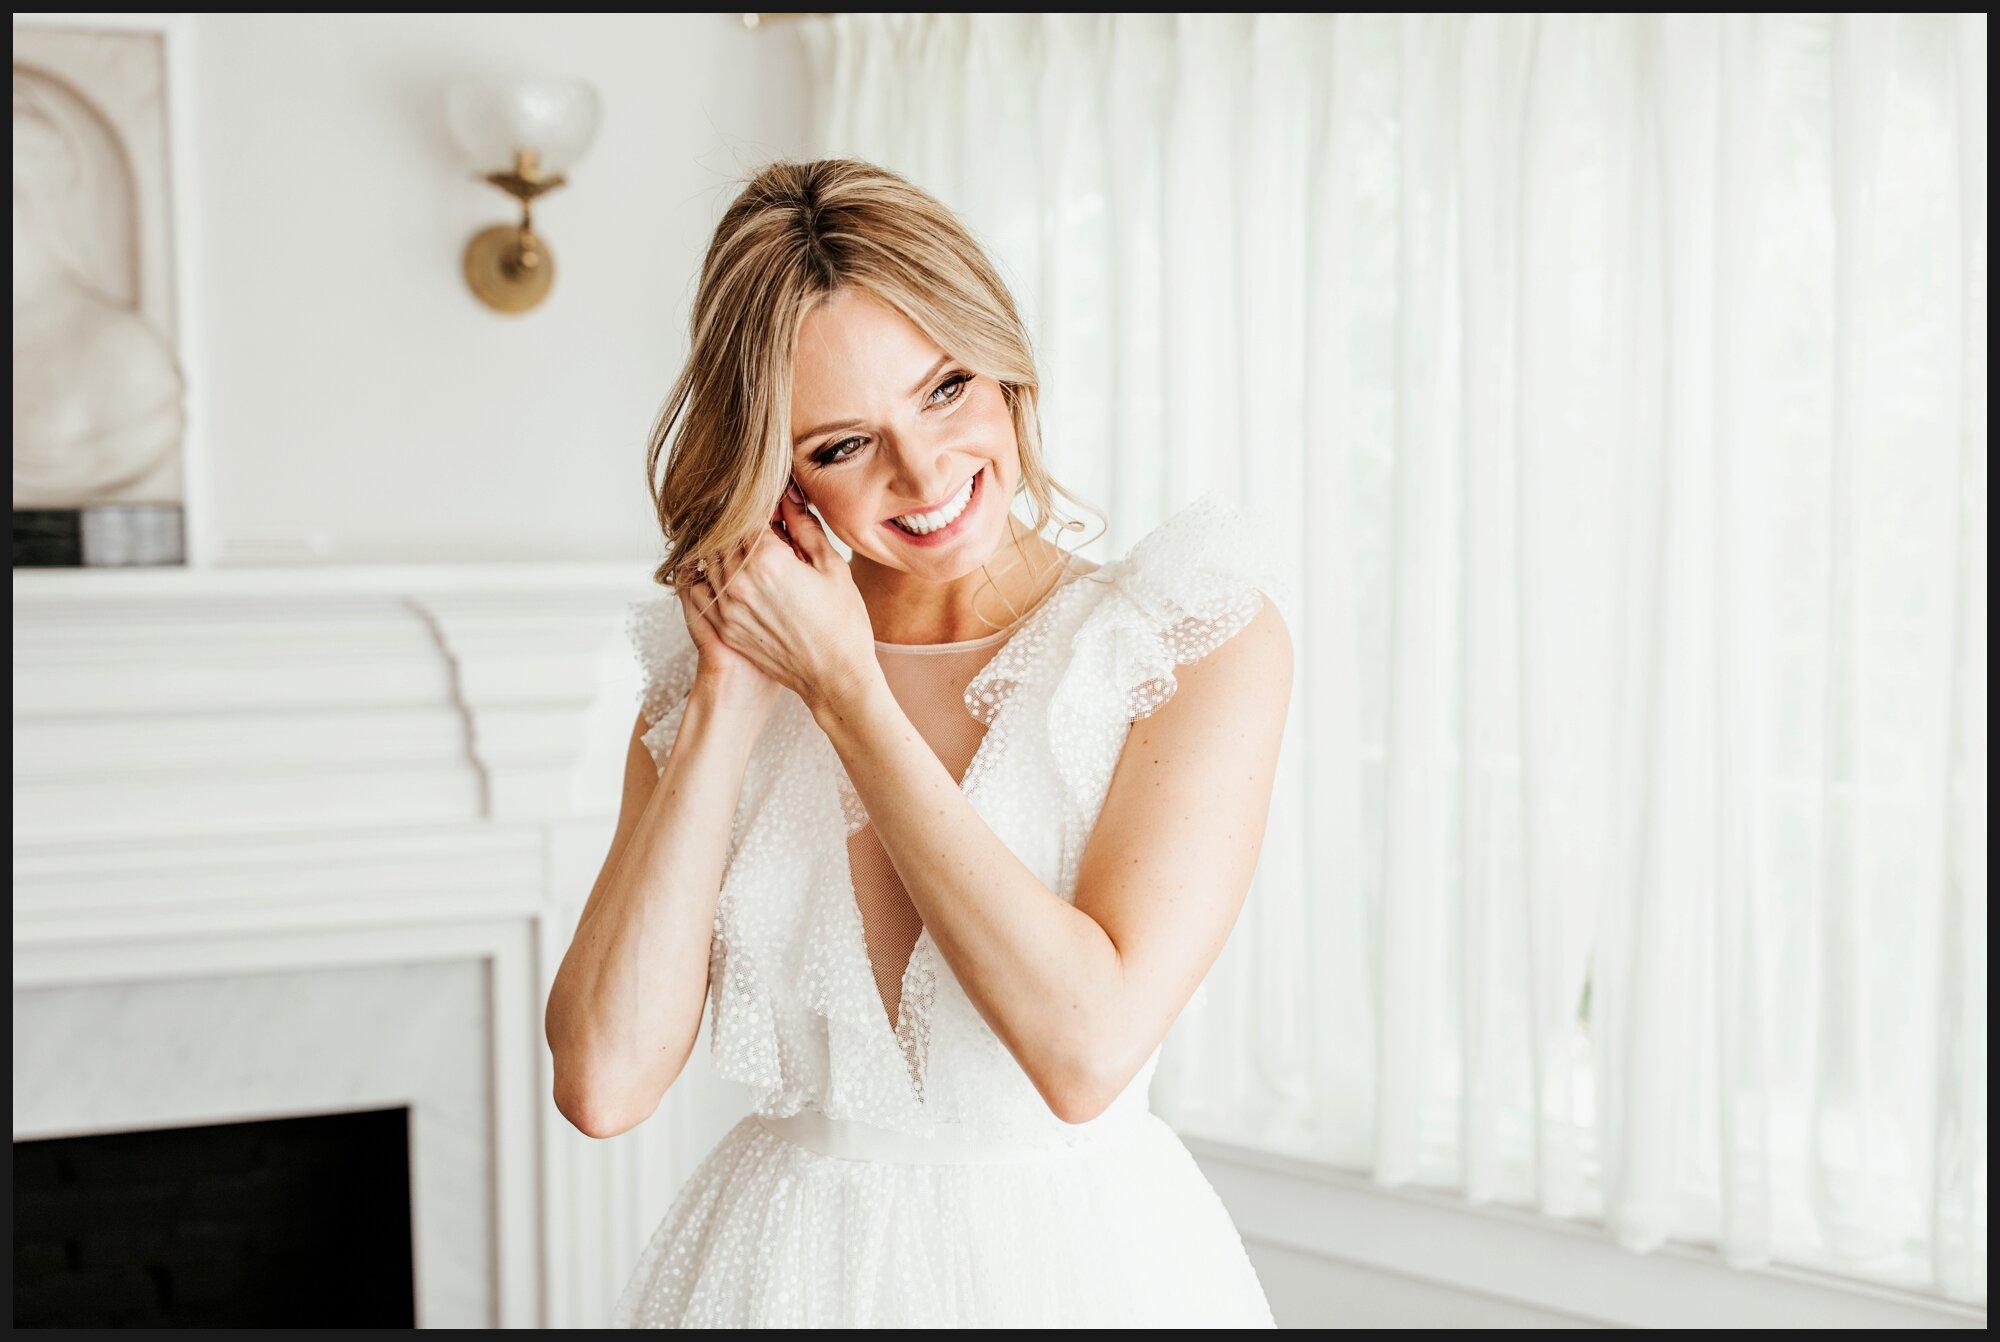 Orlando-Wedding-Photographer-destination-wedding-photographer-florida-wedding-photographer-hawaii-wedding-photographer_0735.jpg